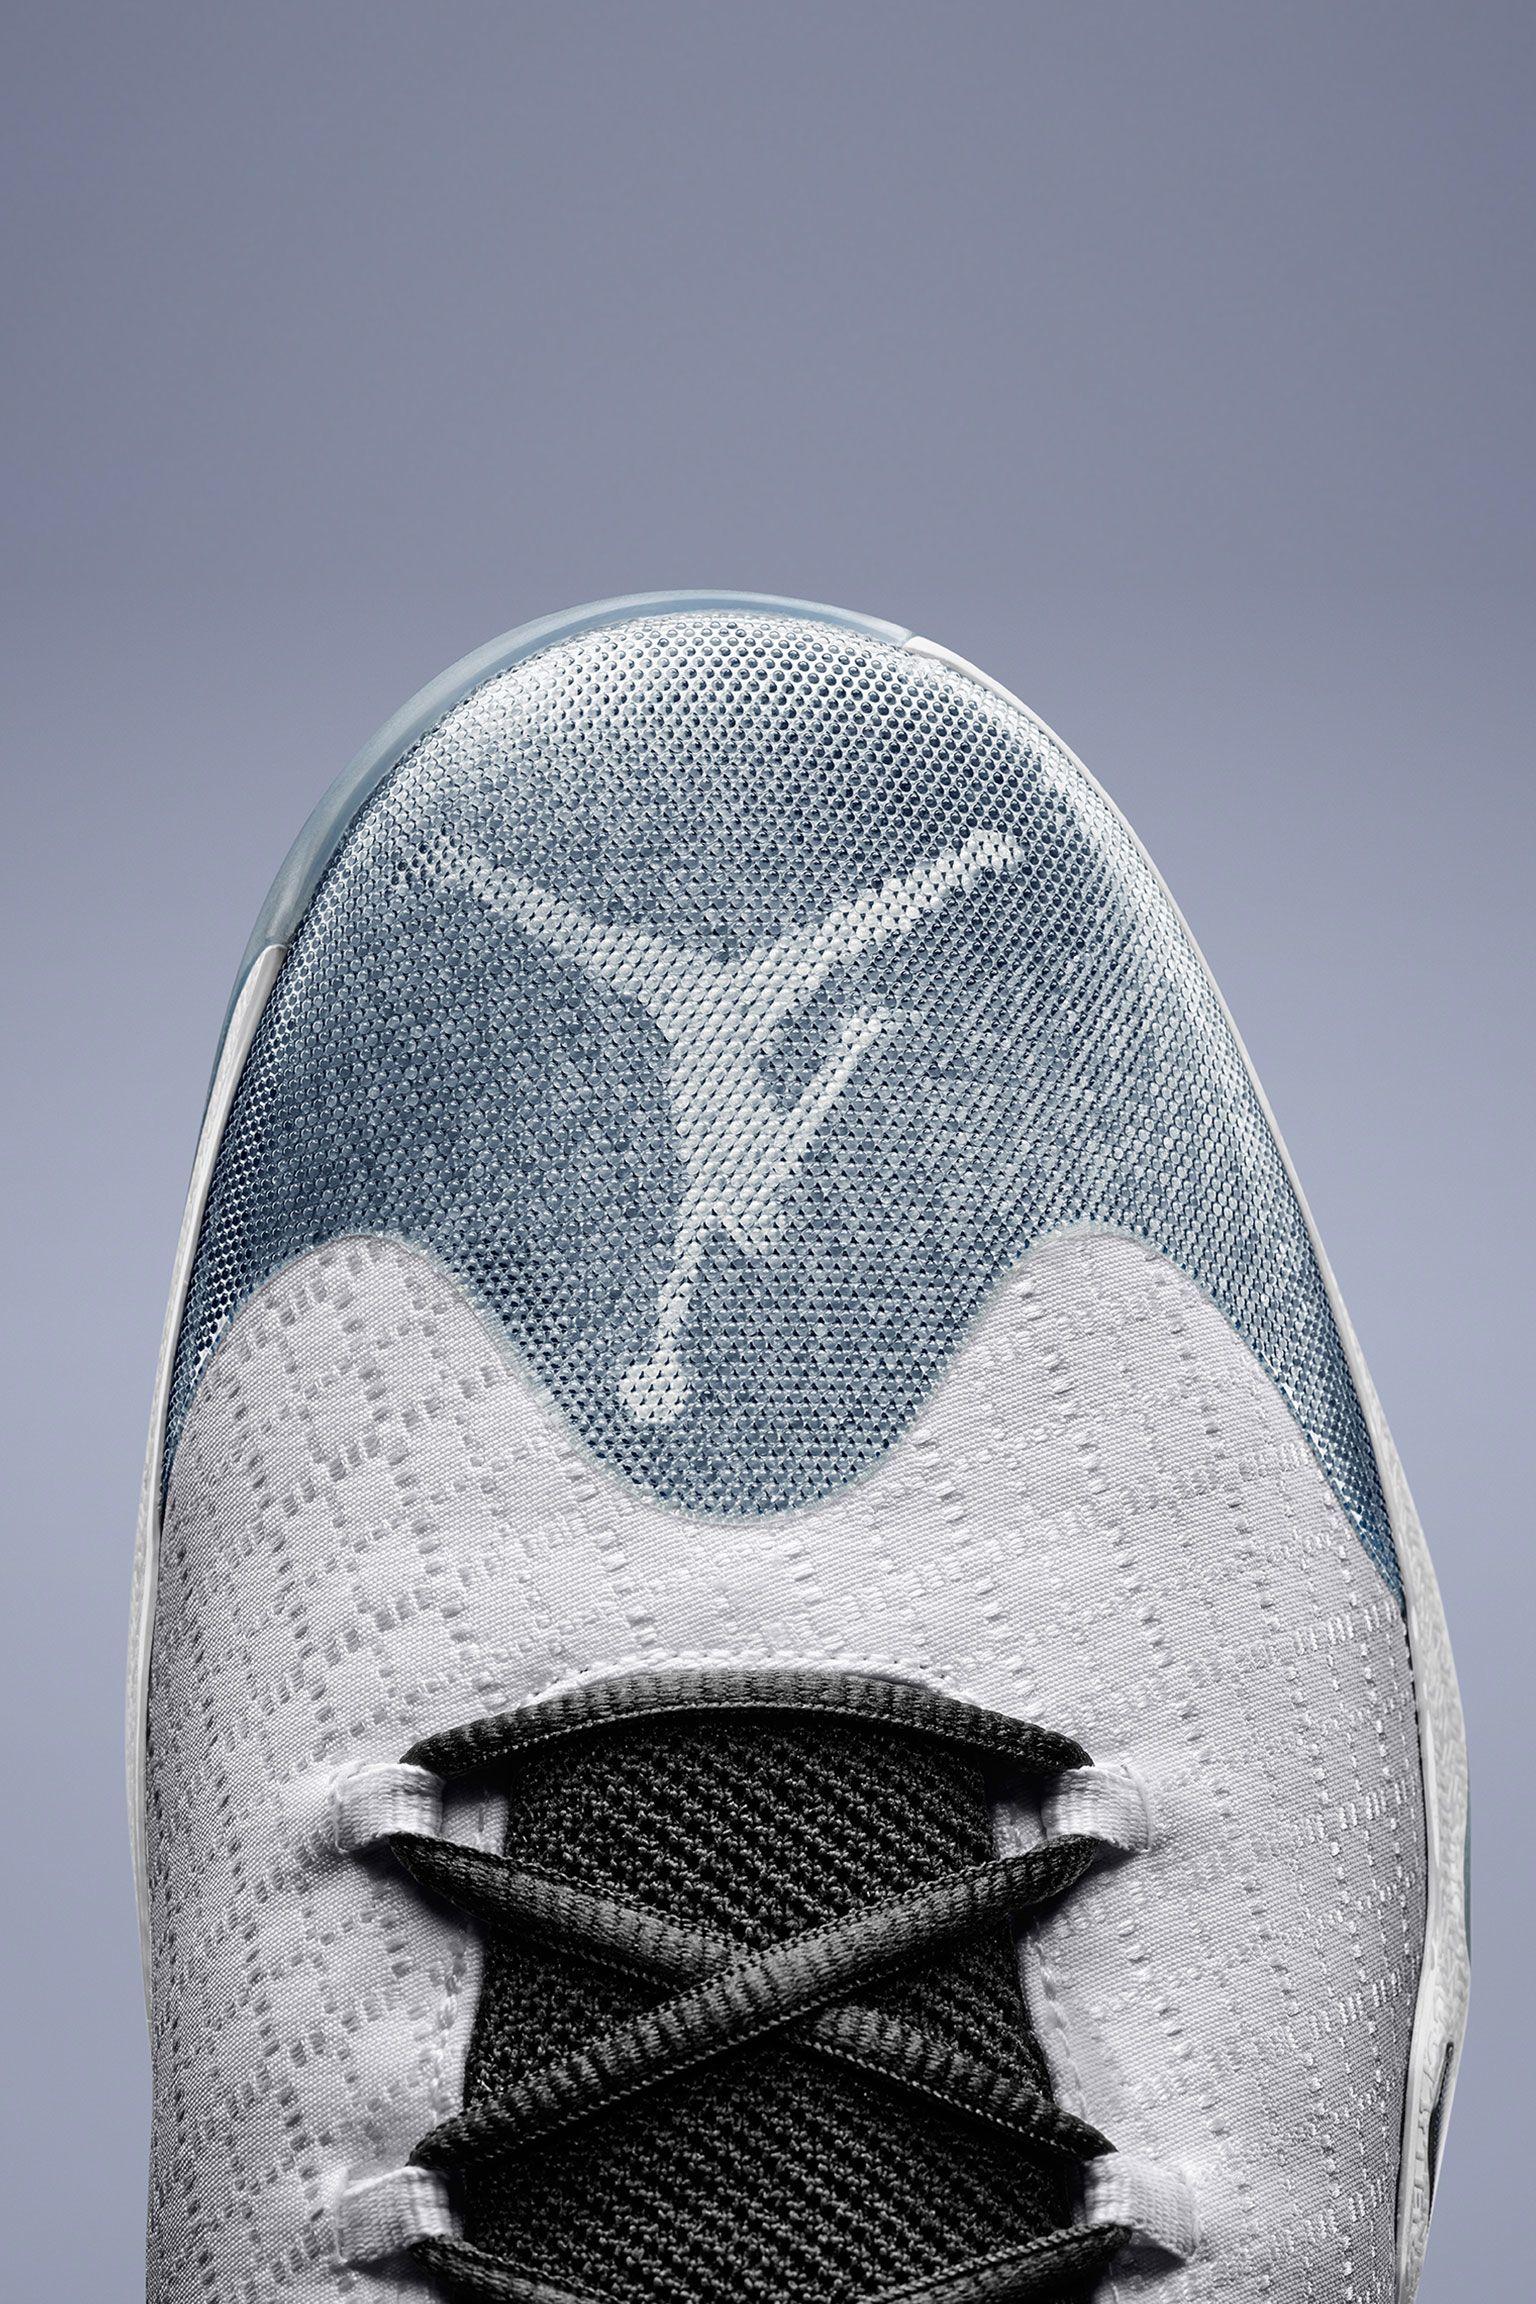 Air Jordan 30 'White & Black-Wolf Grey' Release Date